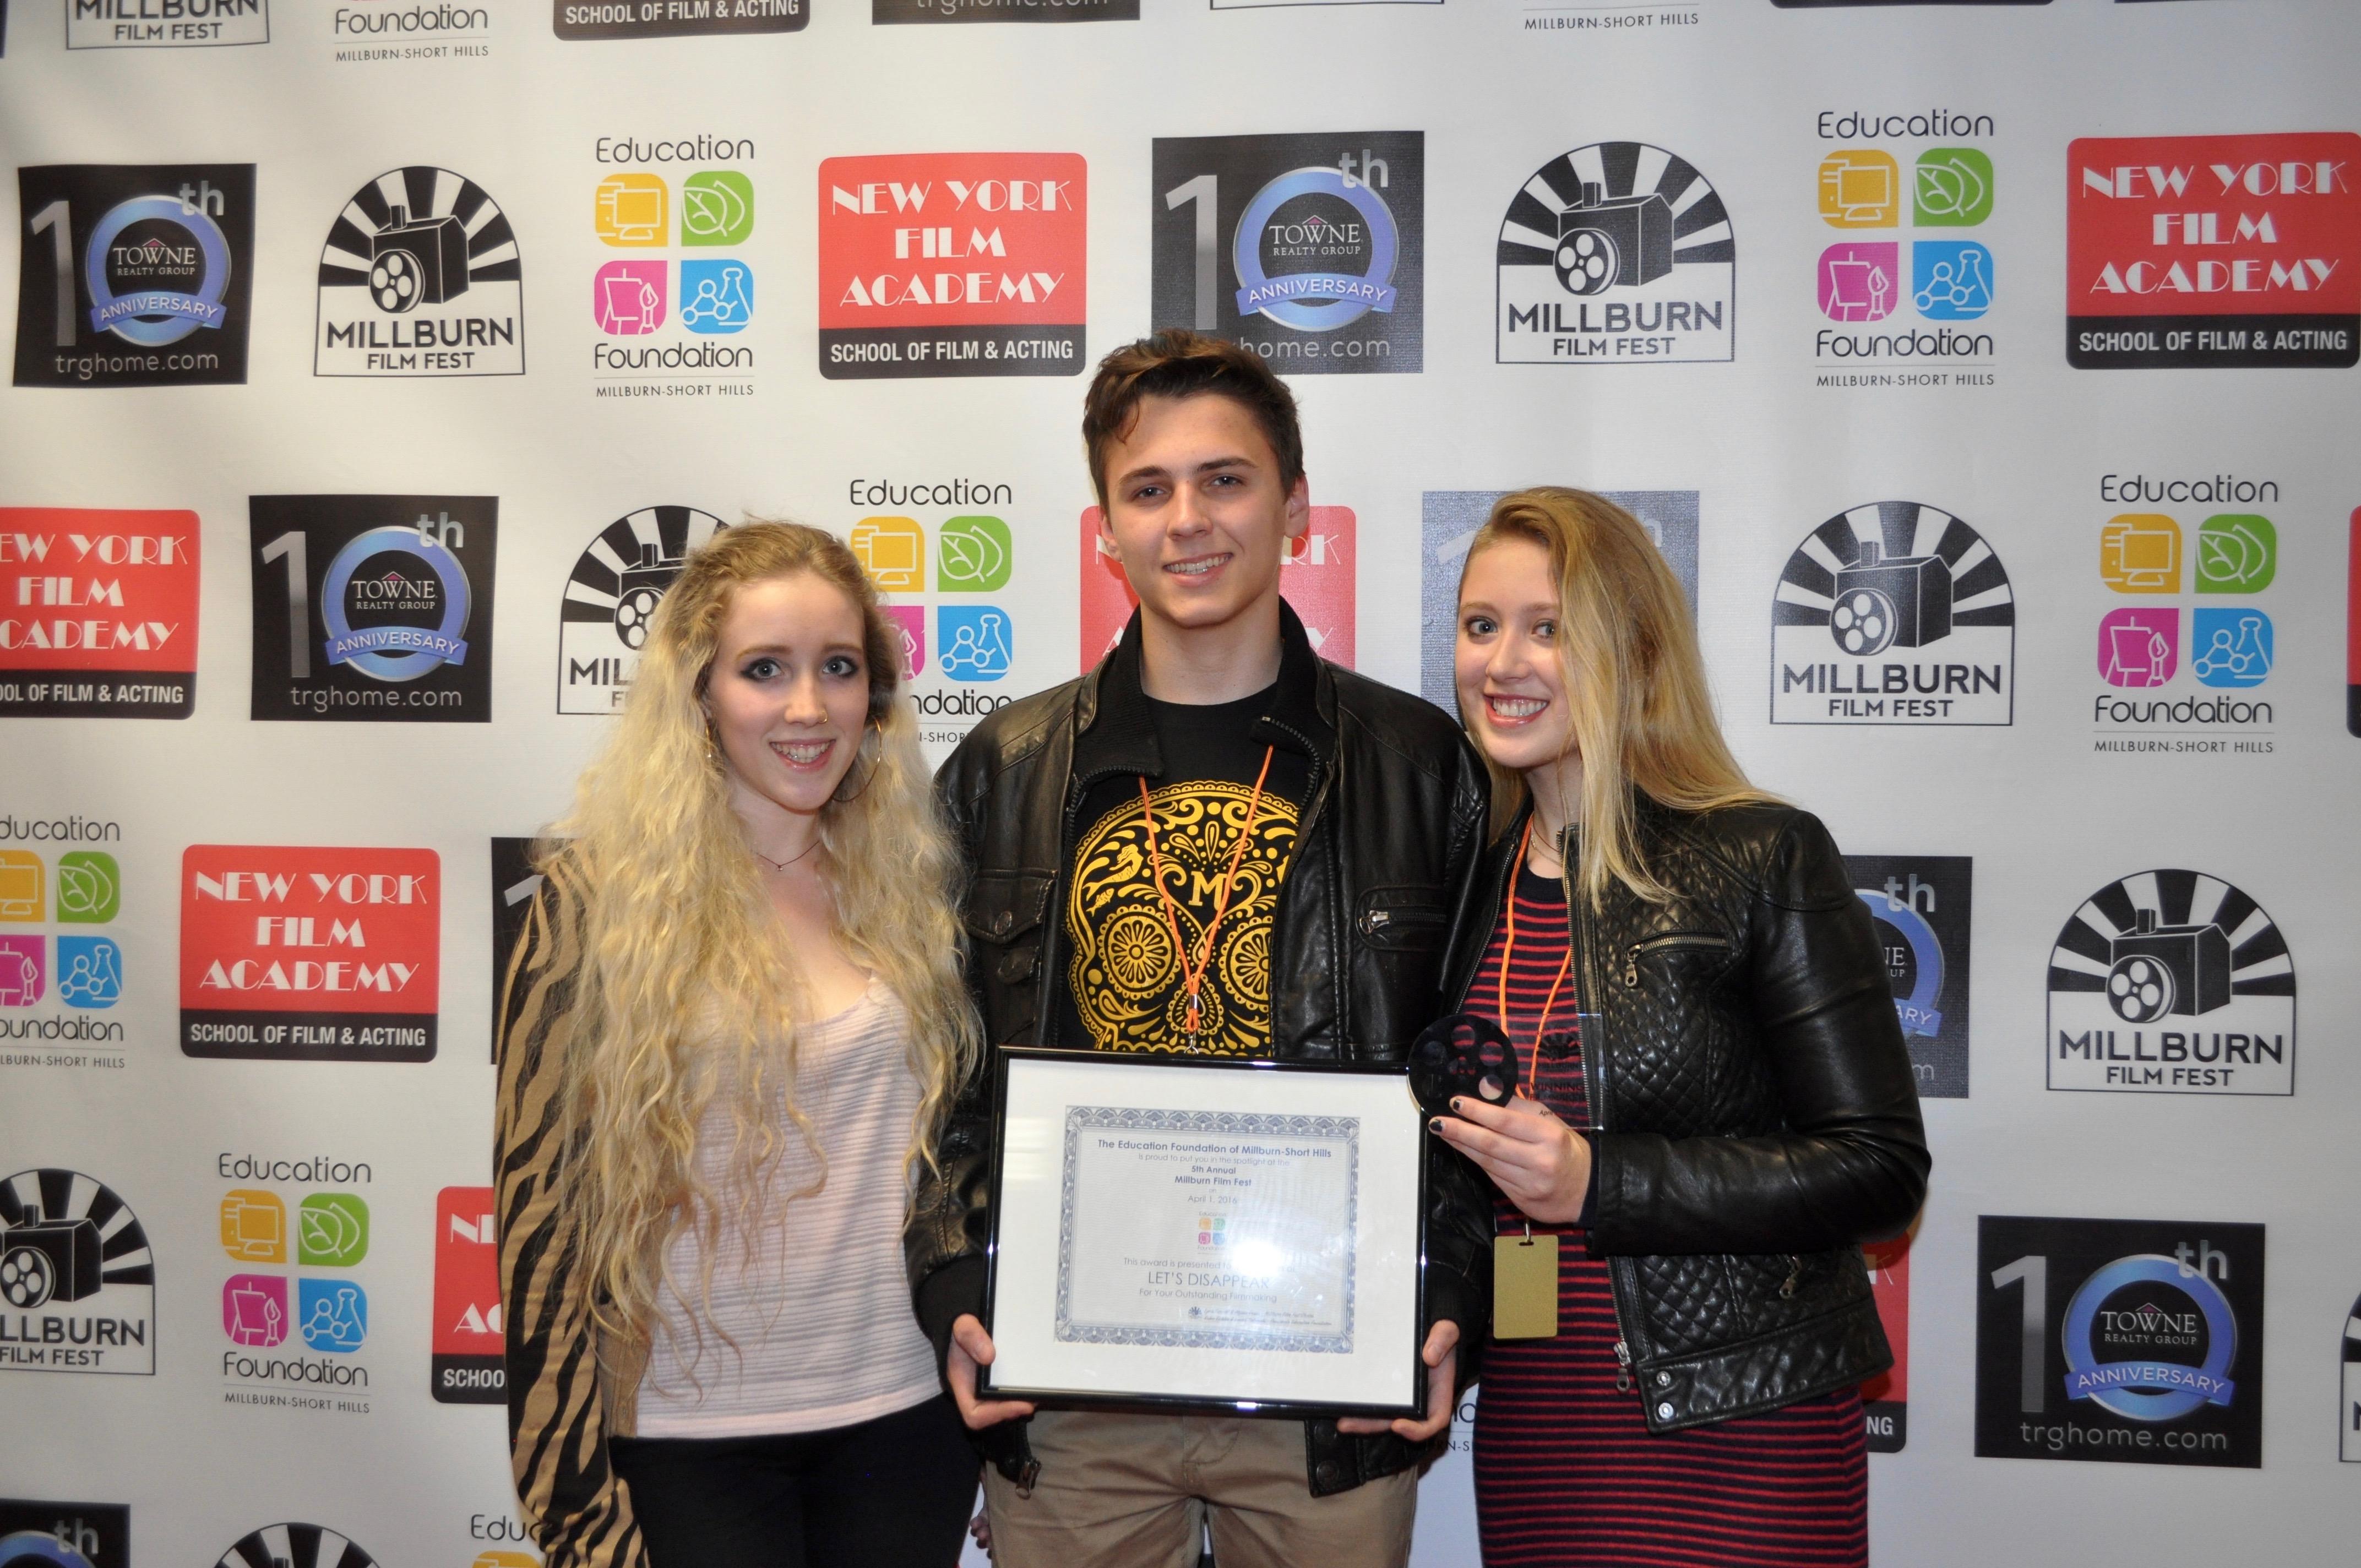 Jasen Aziz Takes Top Prize at the 2016 Millburn Film Fest